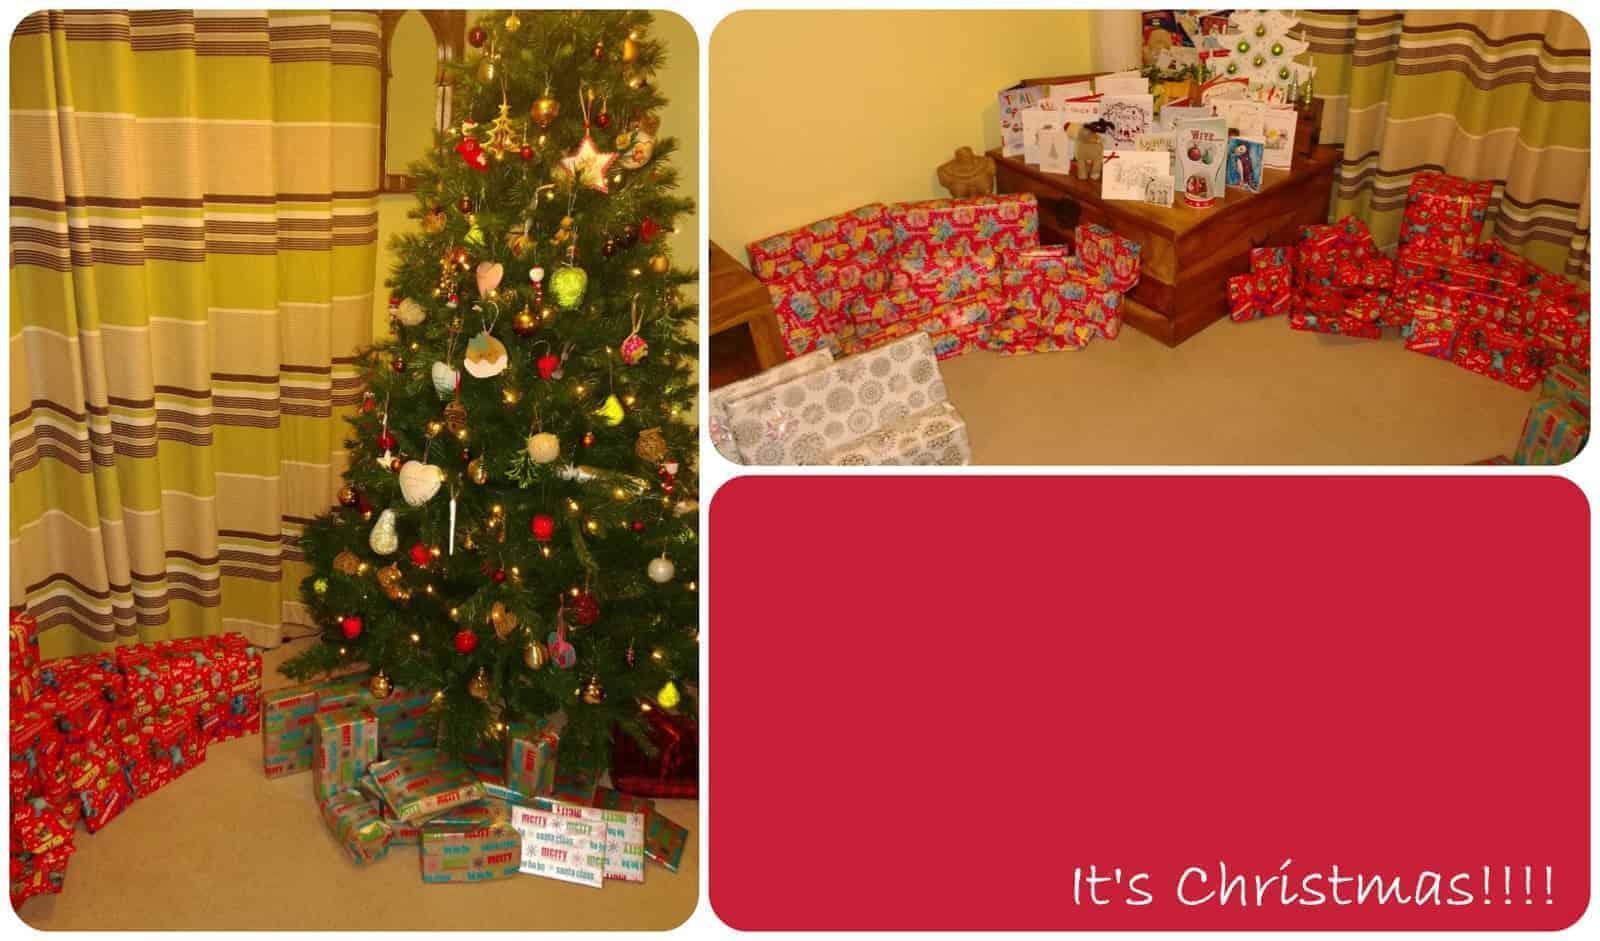 Memories of Christmas past . . .